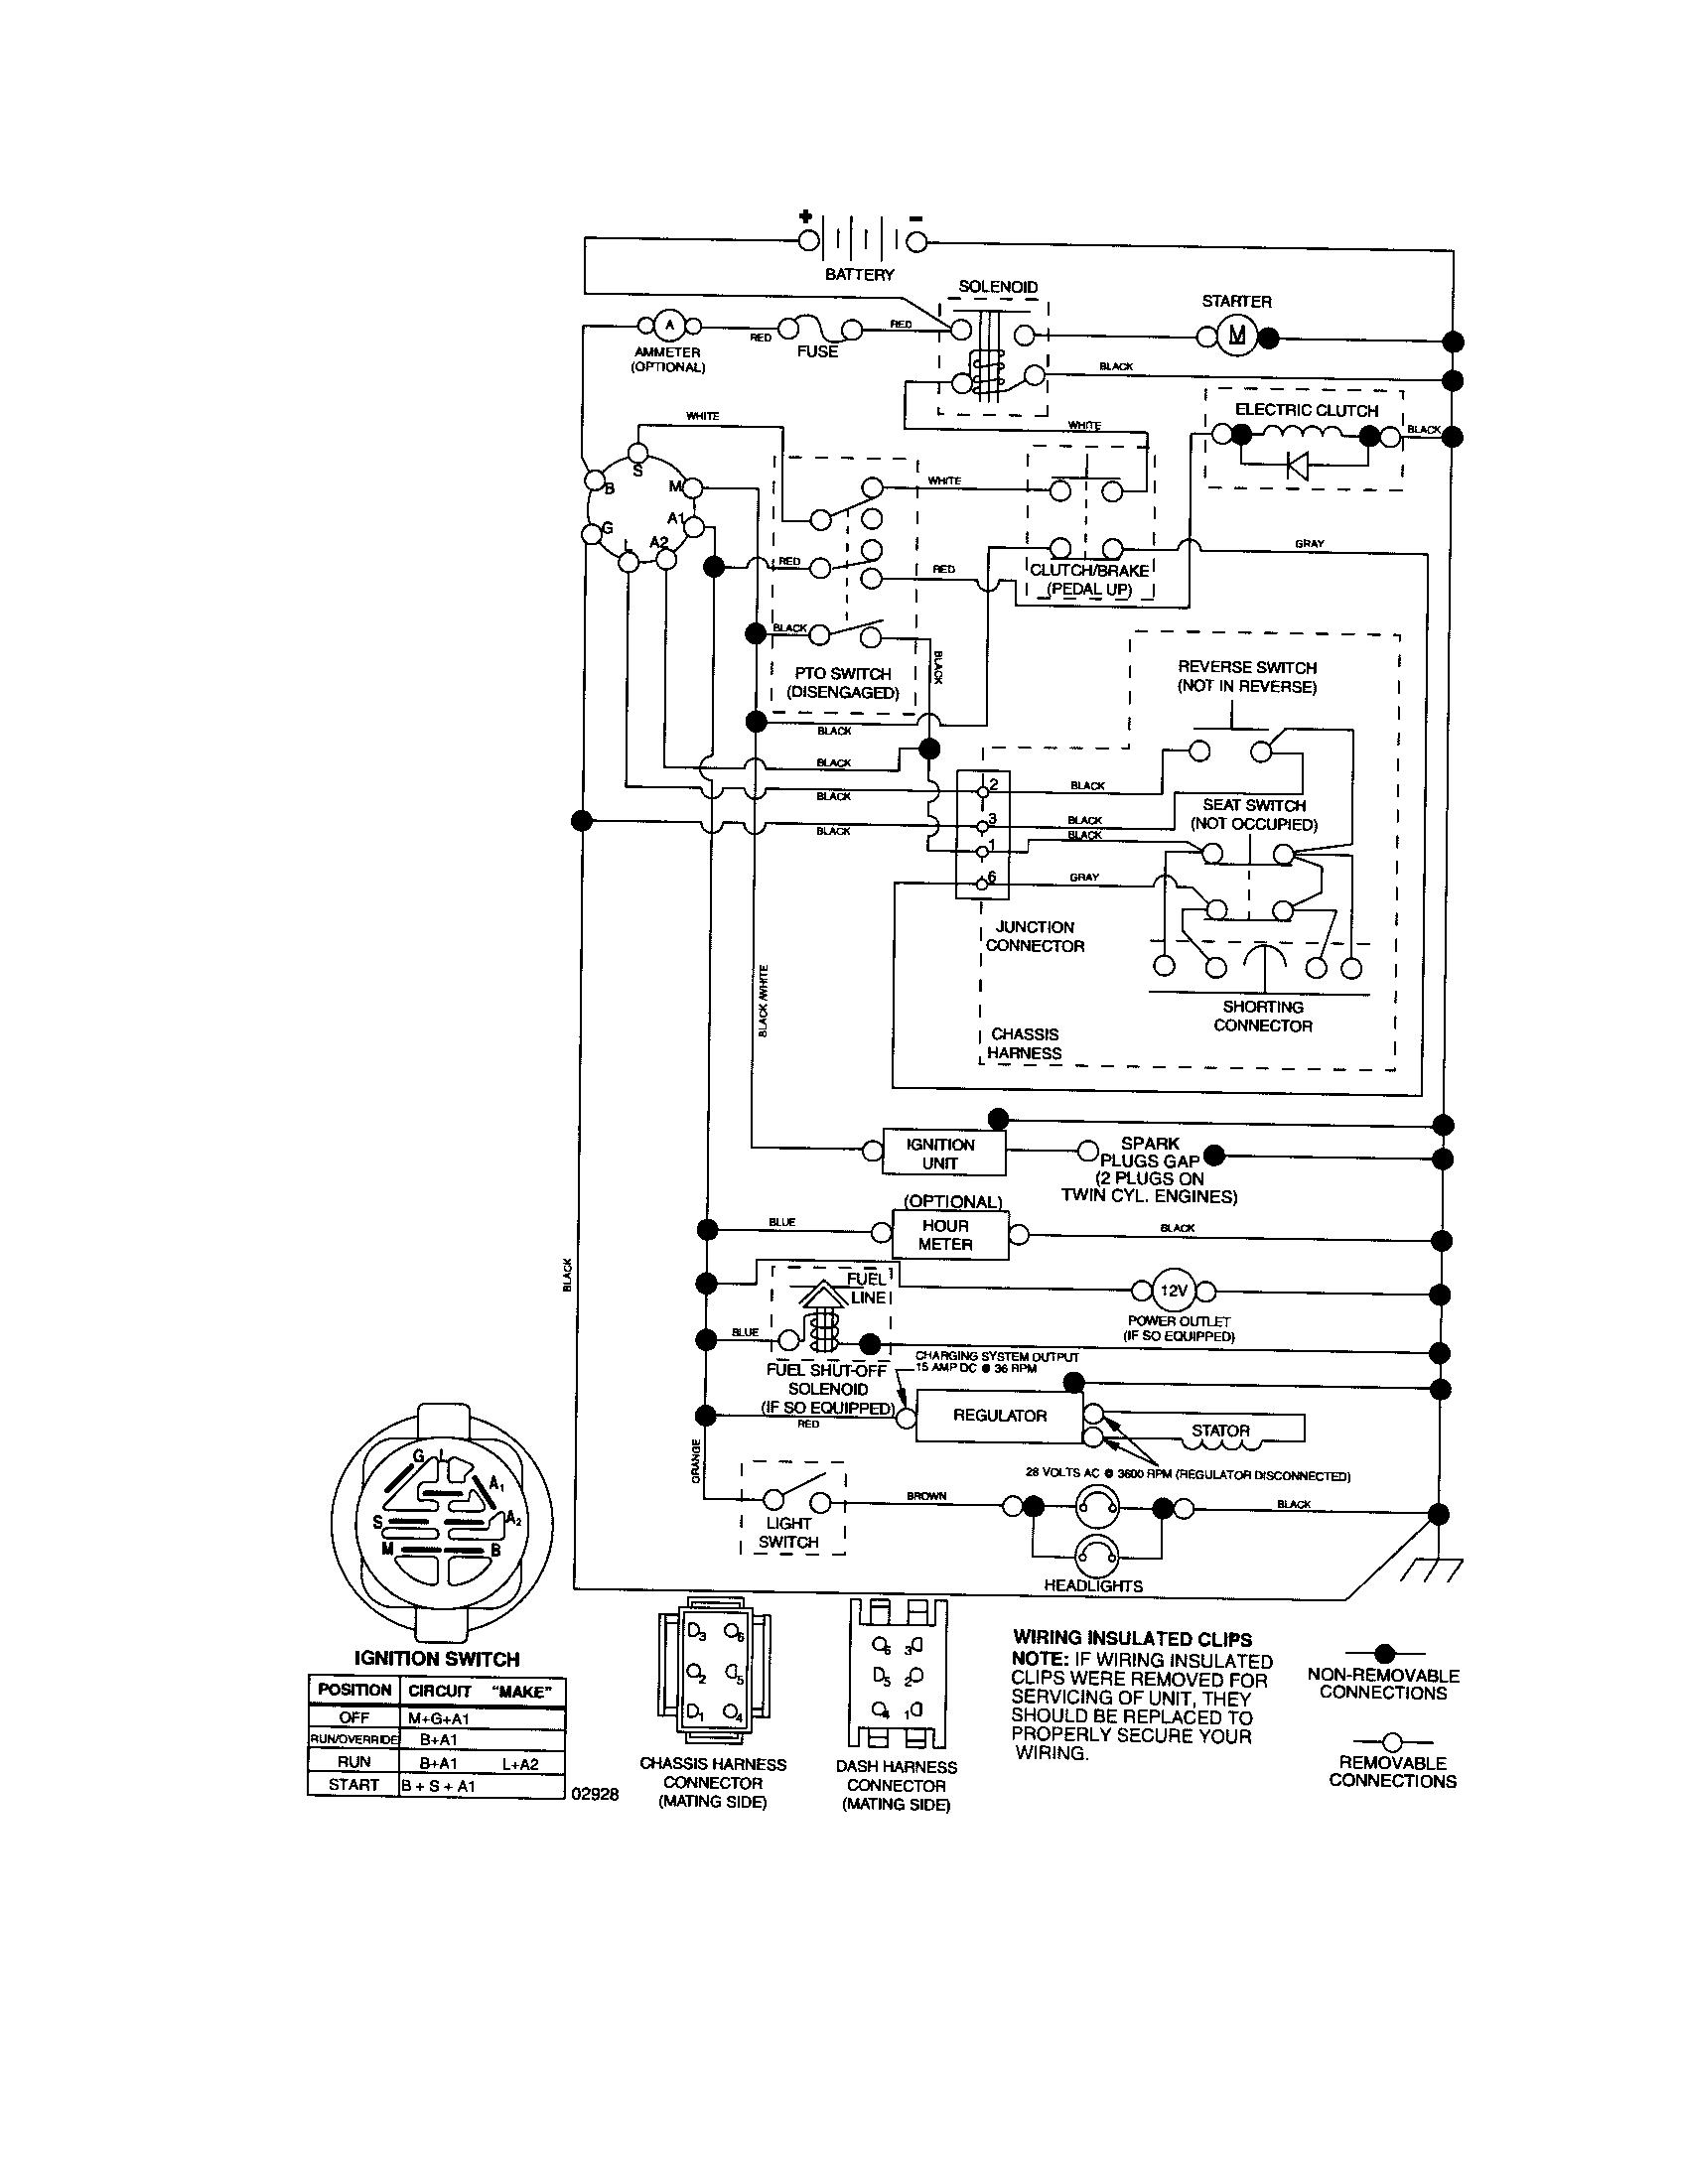 XK_8795] Belt Deck Diagram Craftsman 42 Mower Free Image About Wiring  Diagram Schematic WiringPenghe Papxe Mohammedshrine Librar Wiring 101